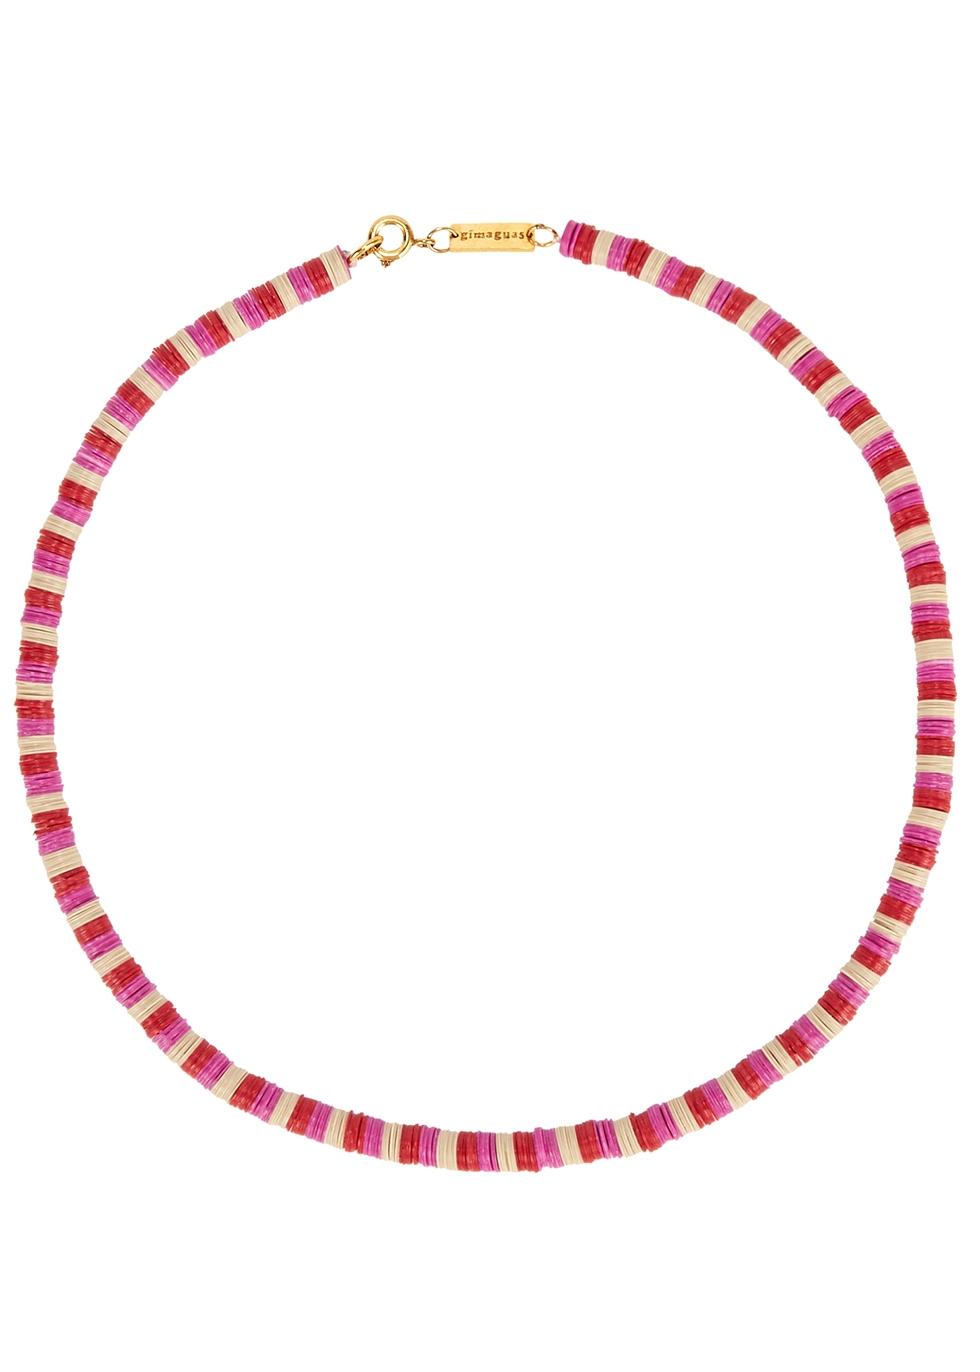 Pukas pink necklace